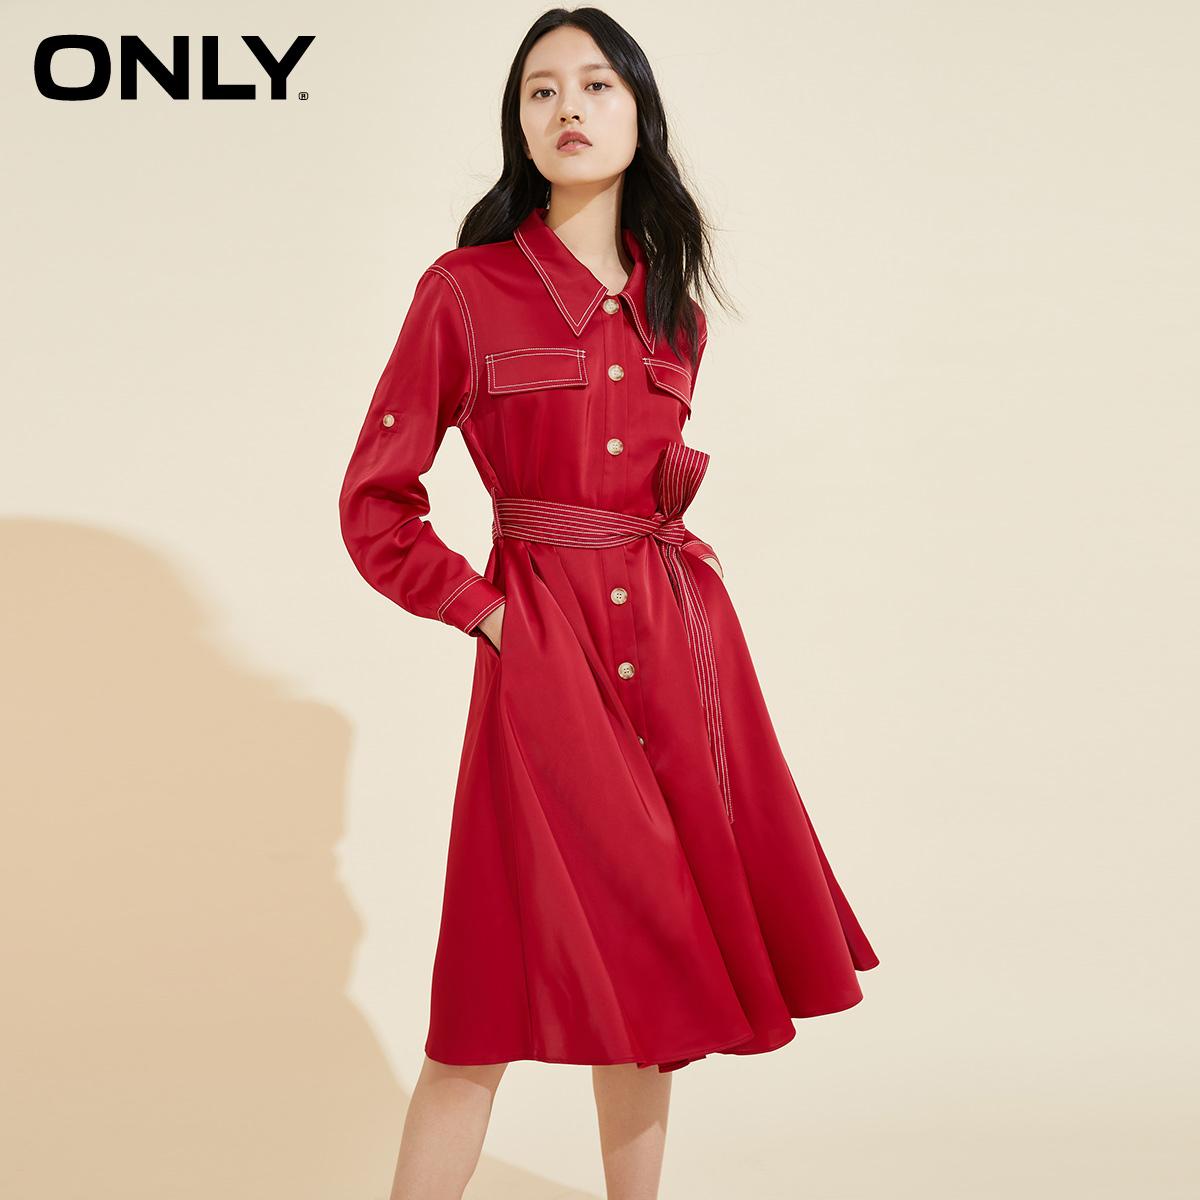 ONLY2020秋季新款气质收腰长袖中长款衬衫新年连衣裙女|120107677